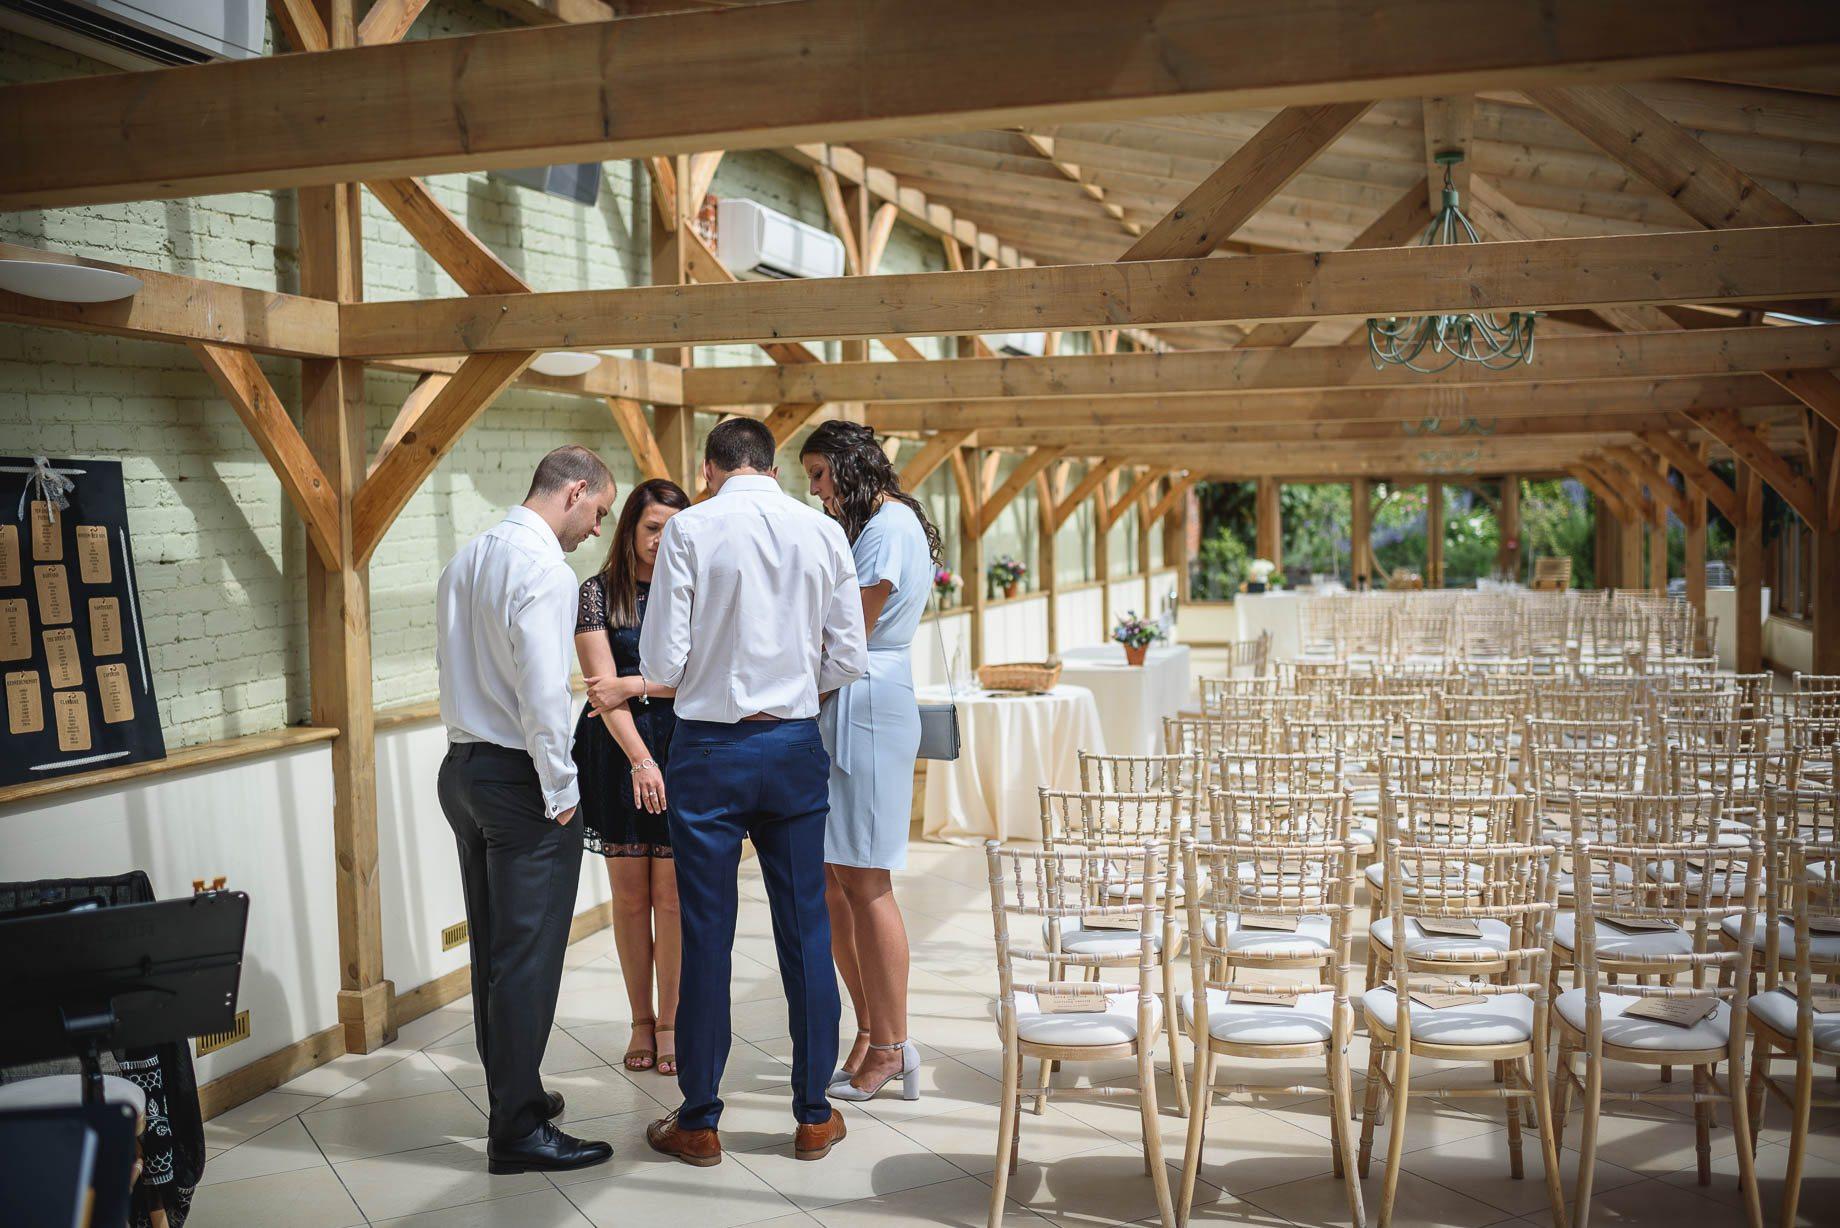 Gaynes Park wedding photography - Guy Collier Photography - Rachel and Jon (27 of 169)